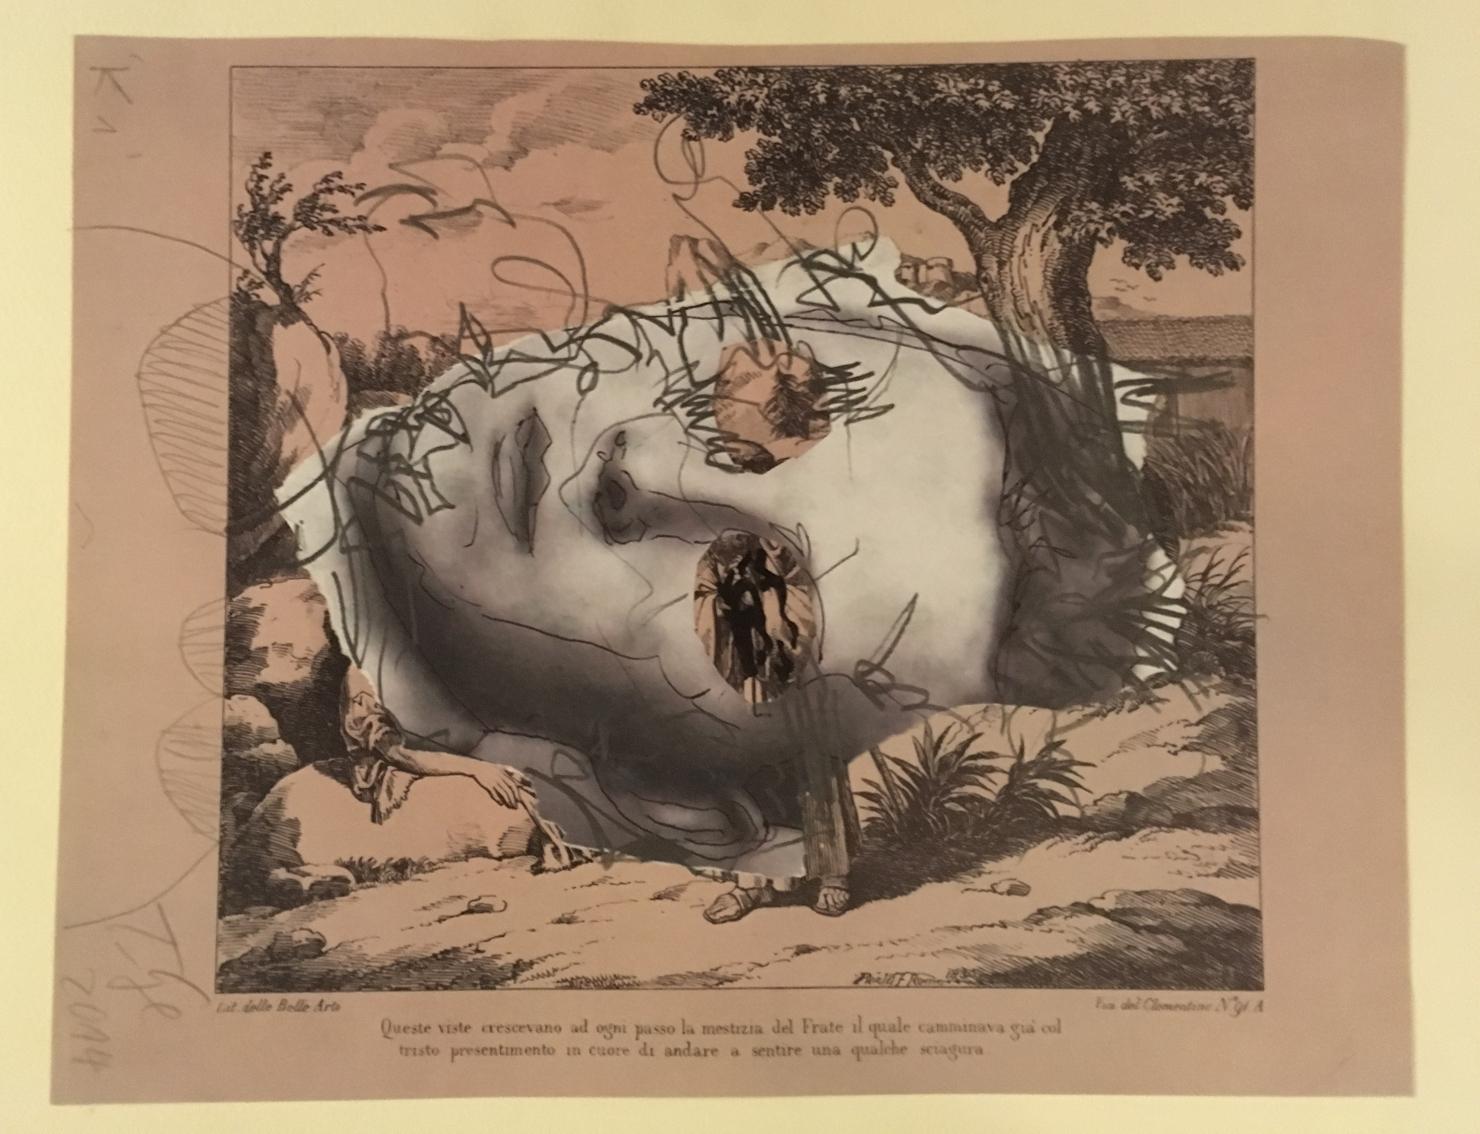 Thomas Lange, K1, 2014, tecnica mista su carta, 30 x 14 cm, courtesy Atelier Thomas Lange